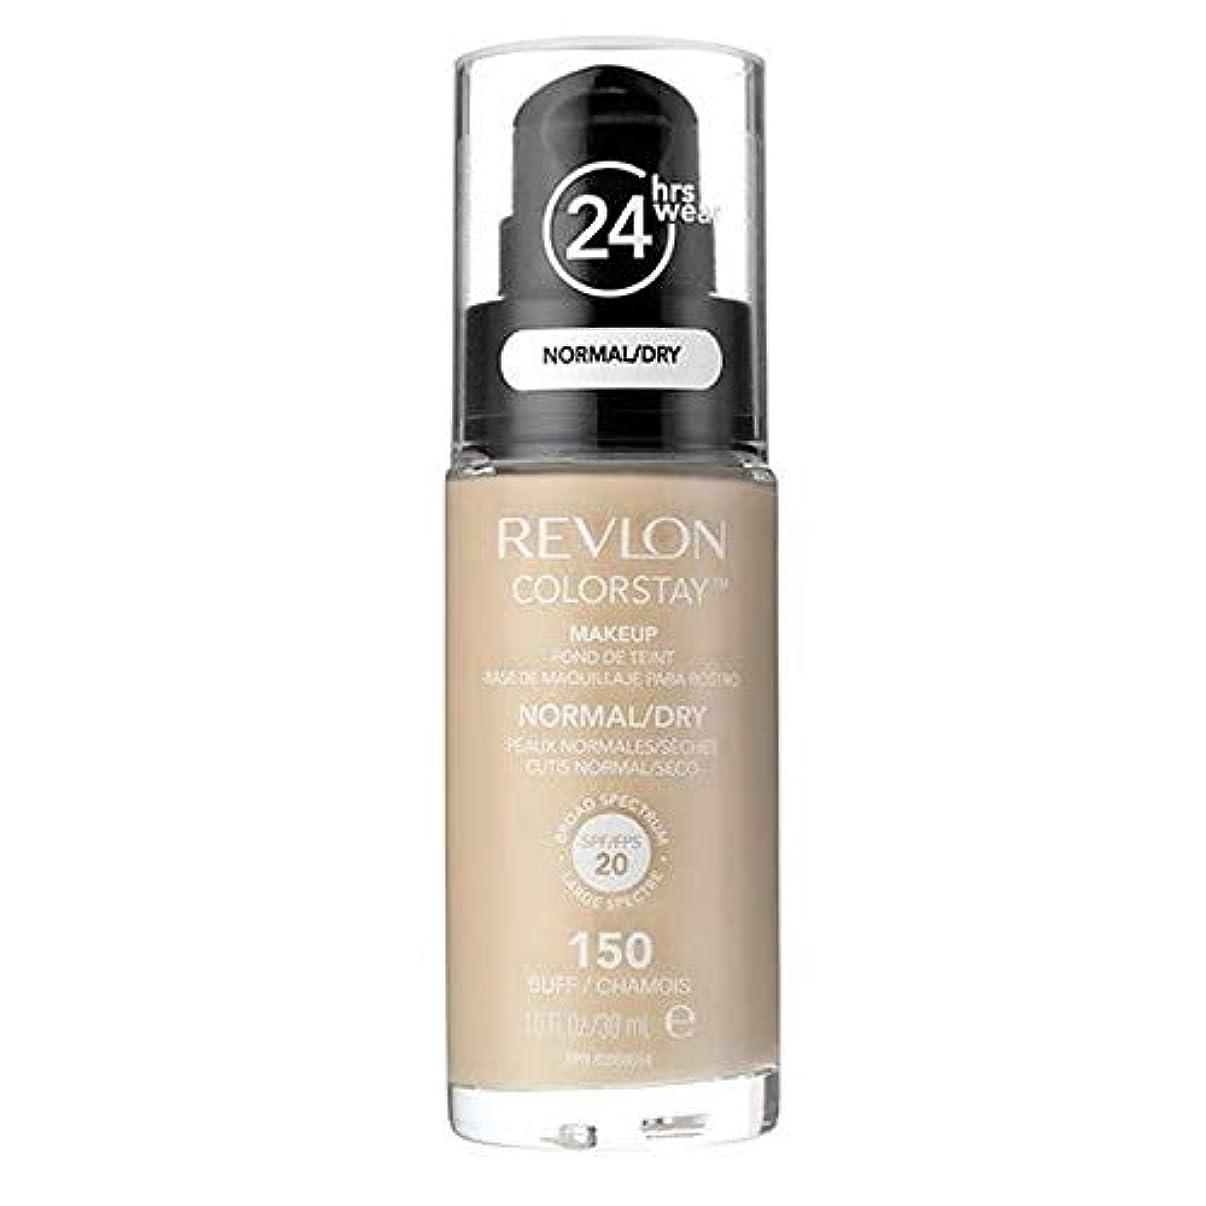 [Revlon ] レブロンカラーステイ基盤ノルム/ドライバフ30ミリリットル - Revlon Color Stay Foundation Norm/Dry Buff 30ml [並行輸入品]